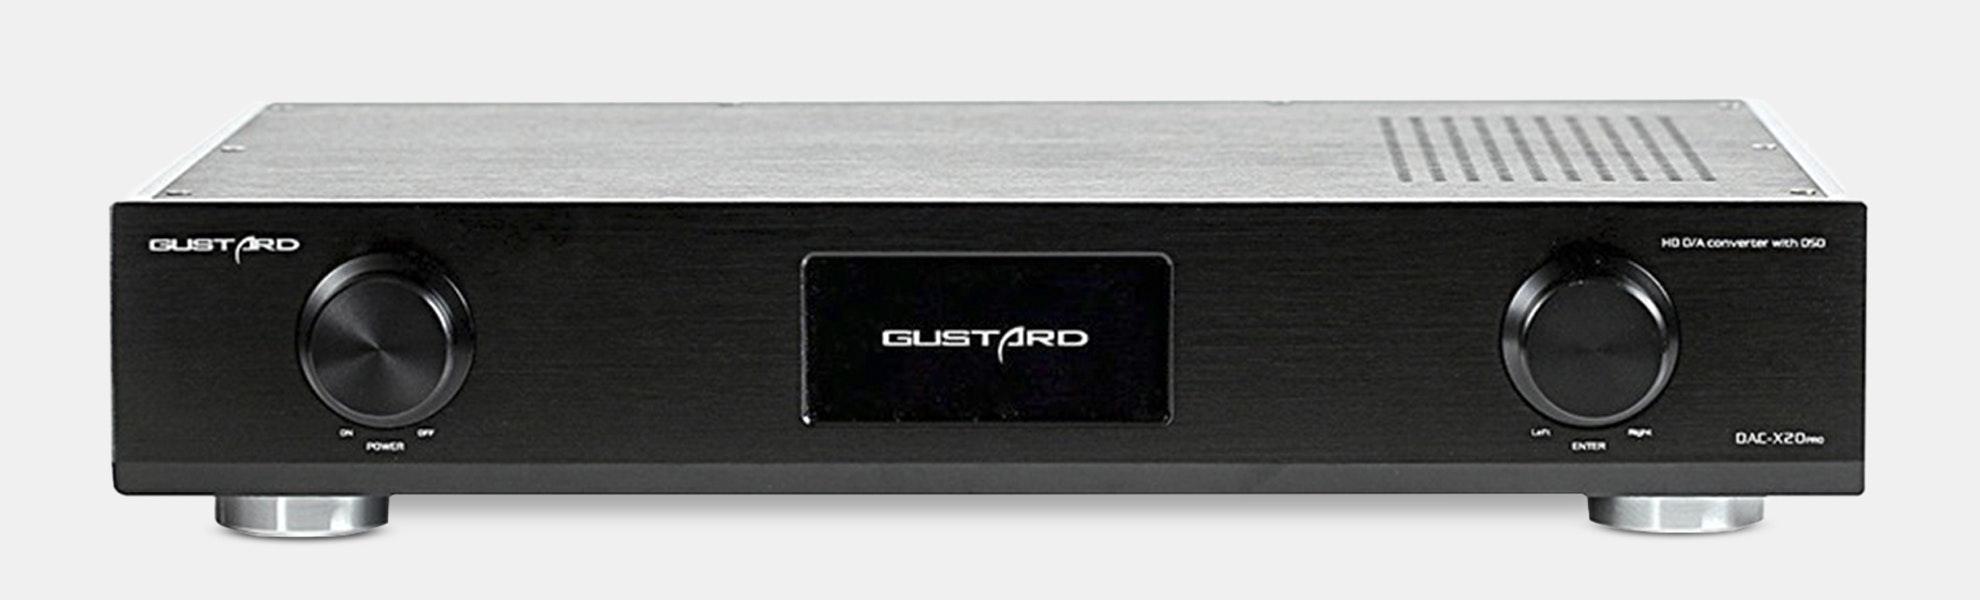 Gustard DAC-X20